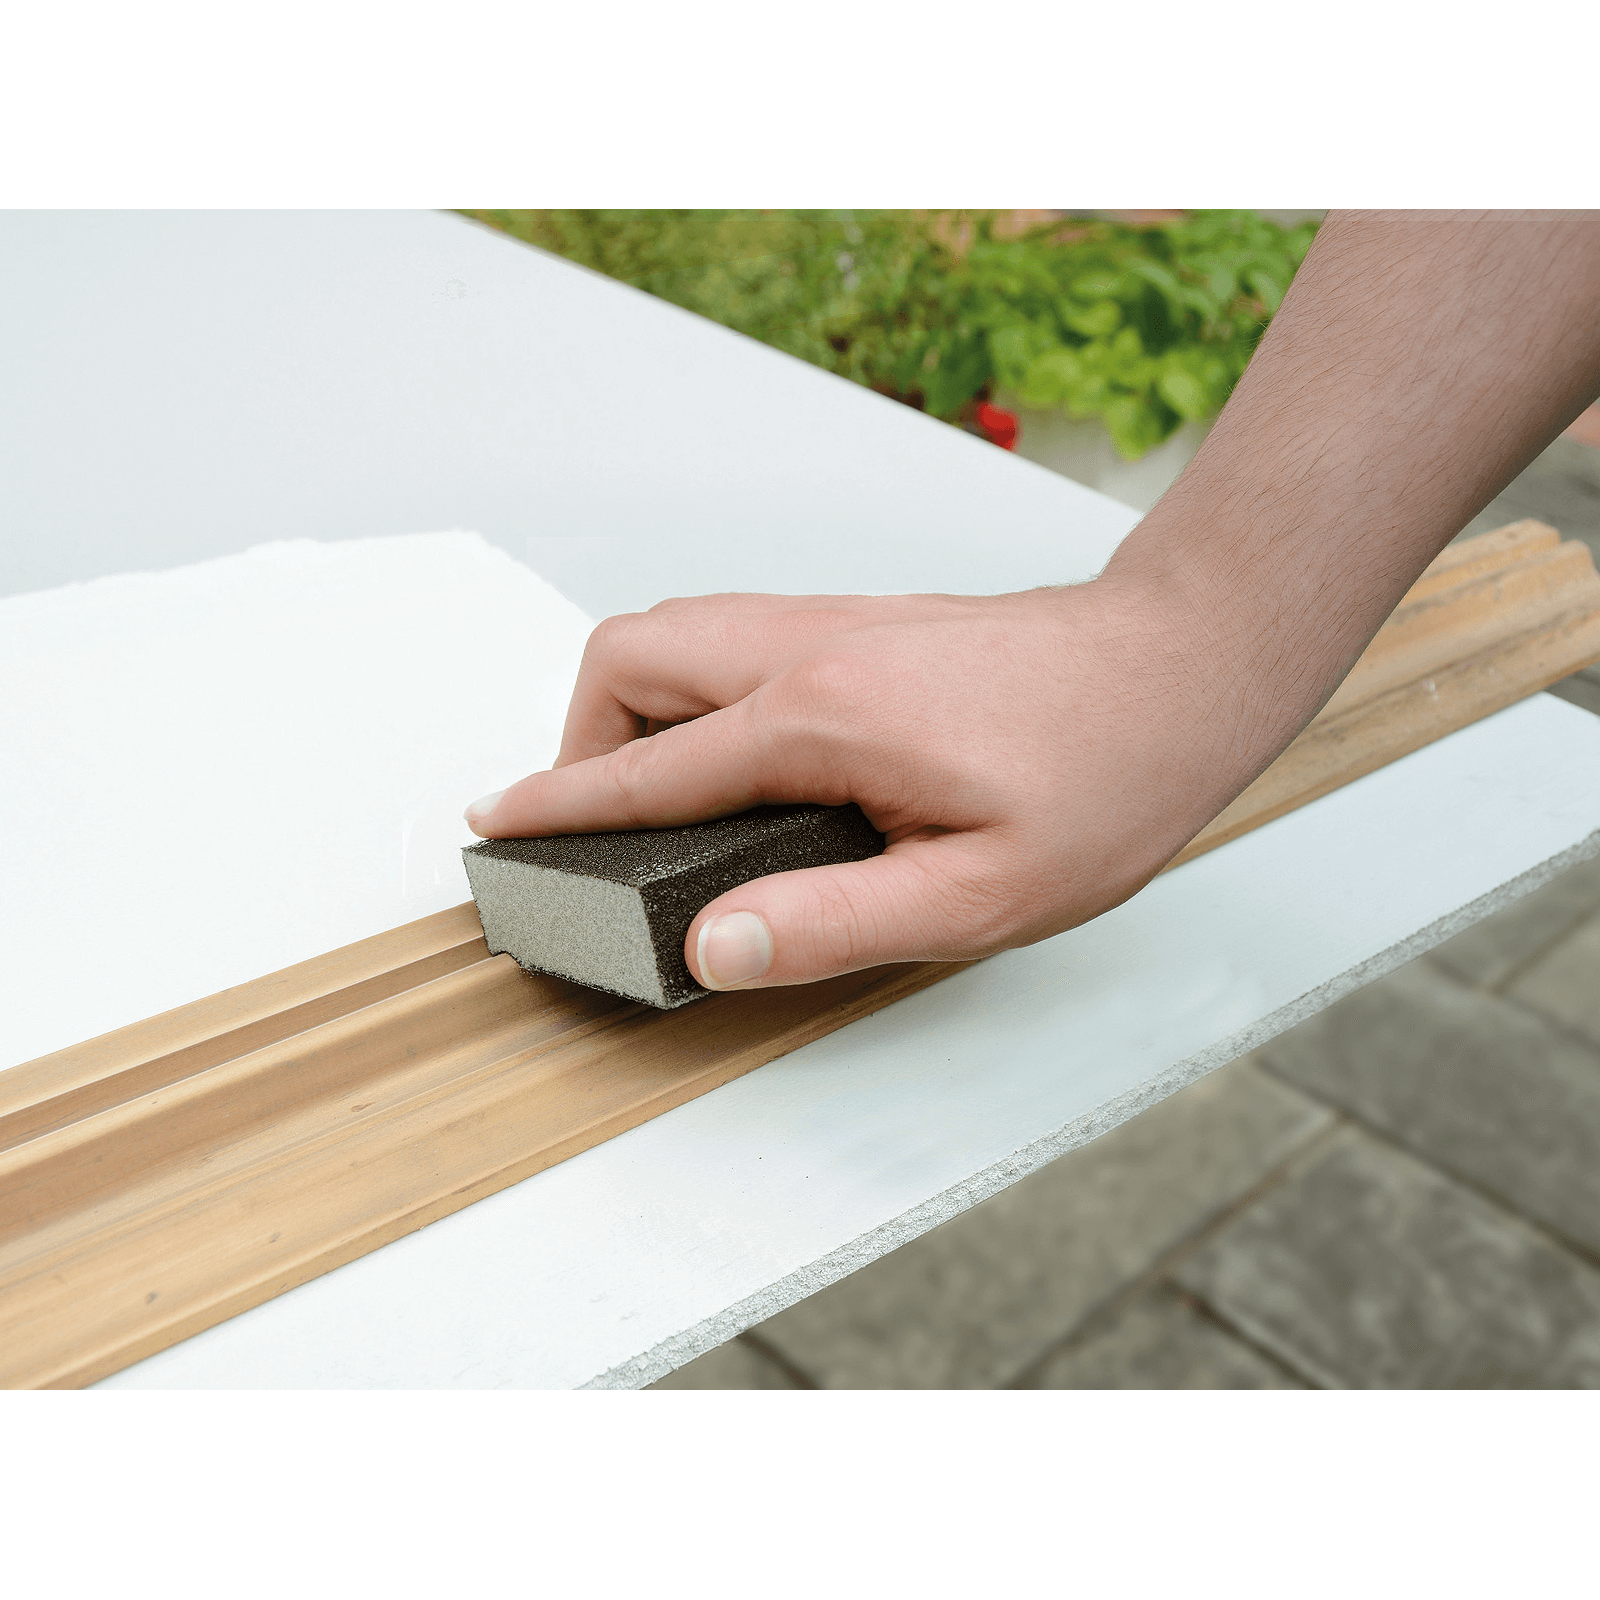 UNi-PRO 2 Flexible Sanding Pads Display of 24 - Fine